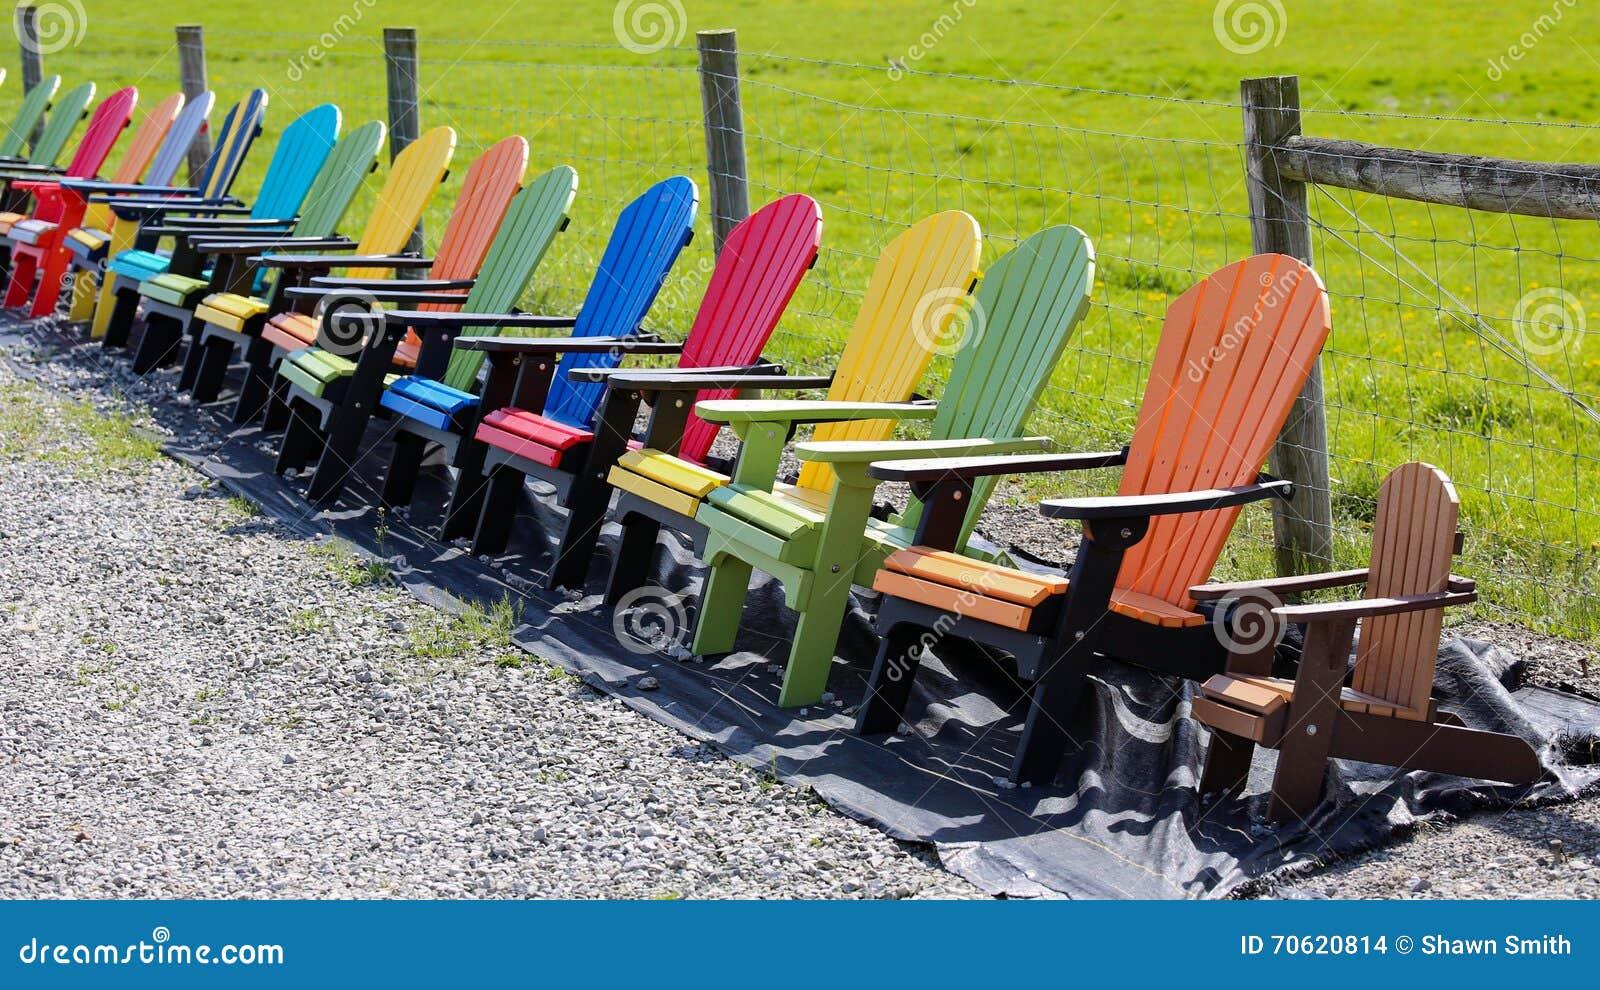 Colorful adirondack chairs - Added Adirondack